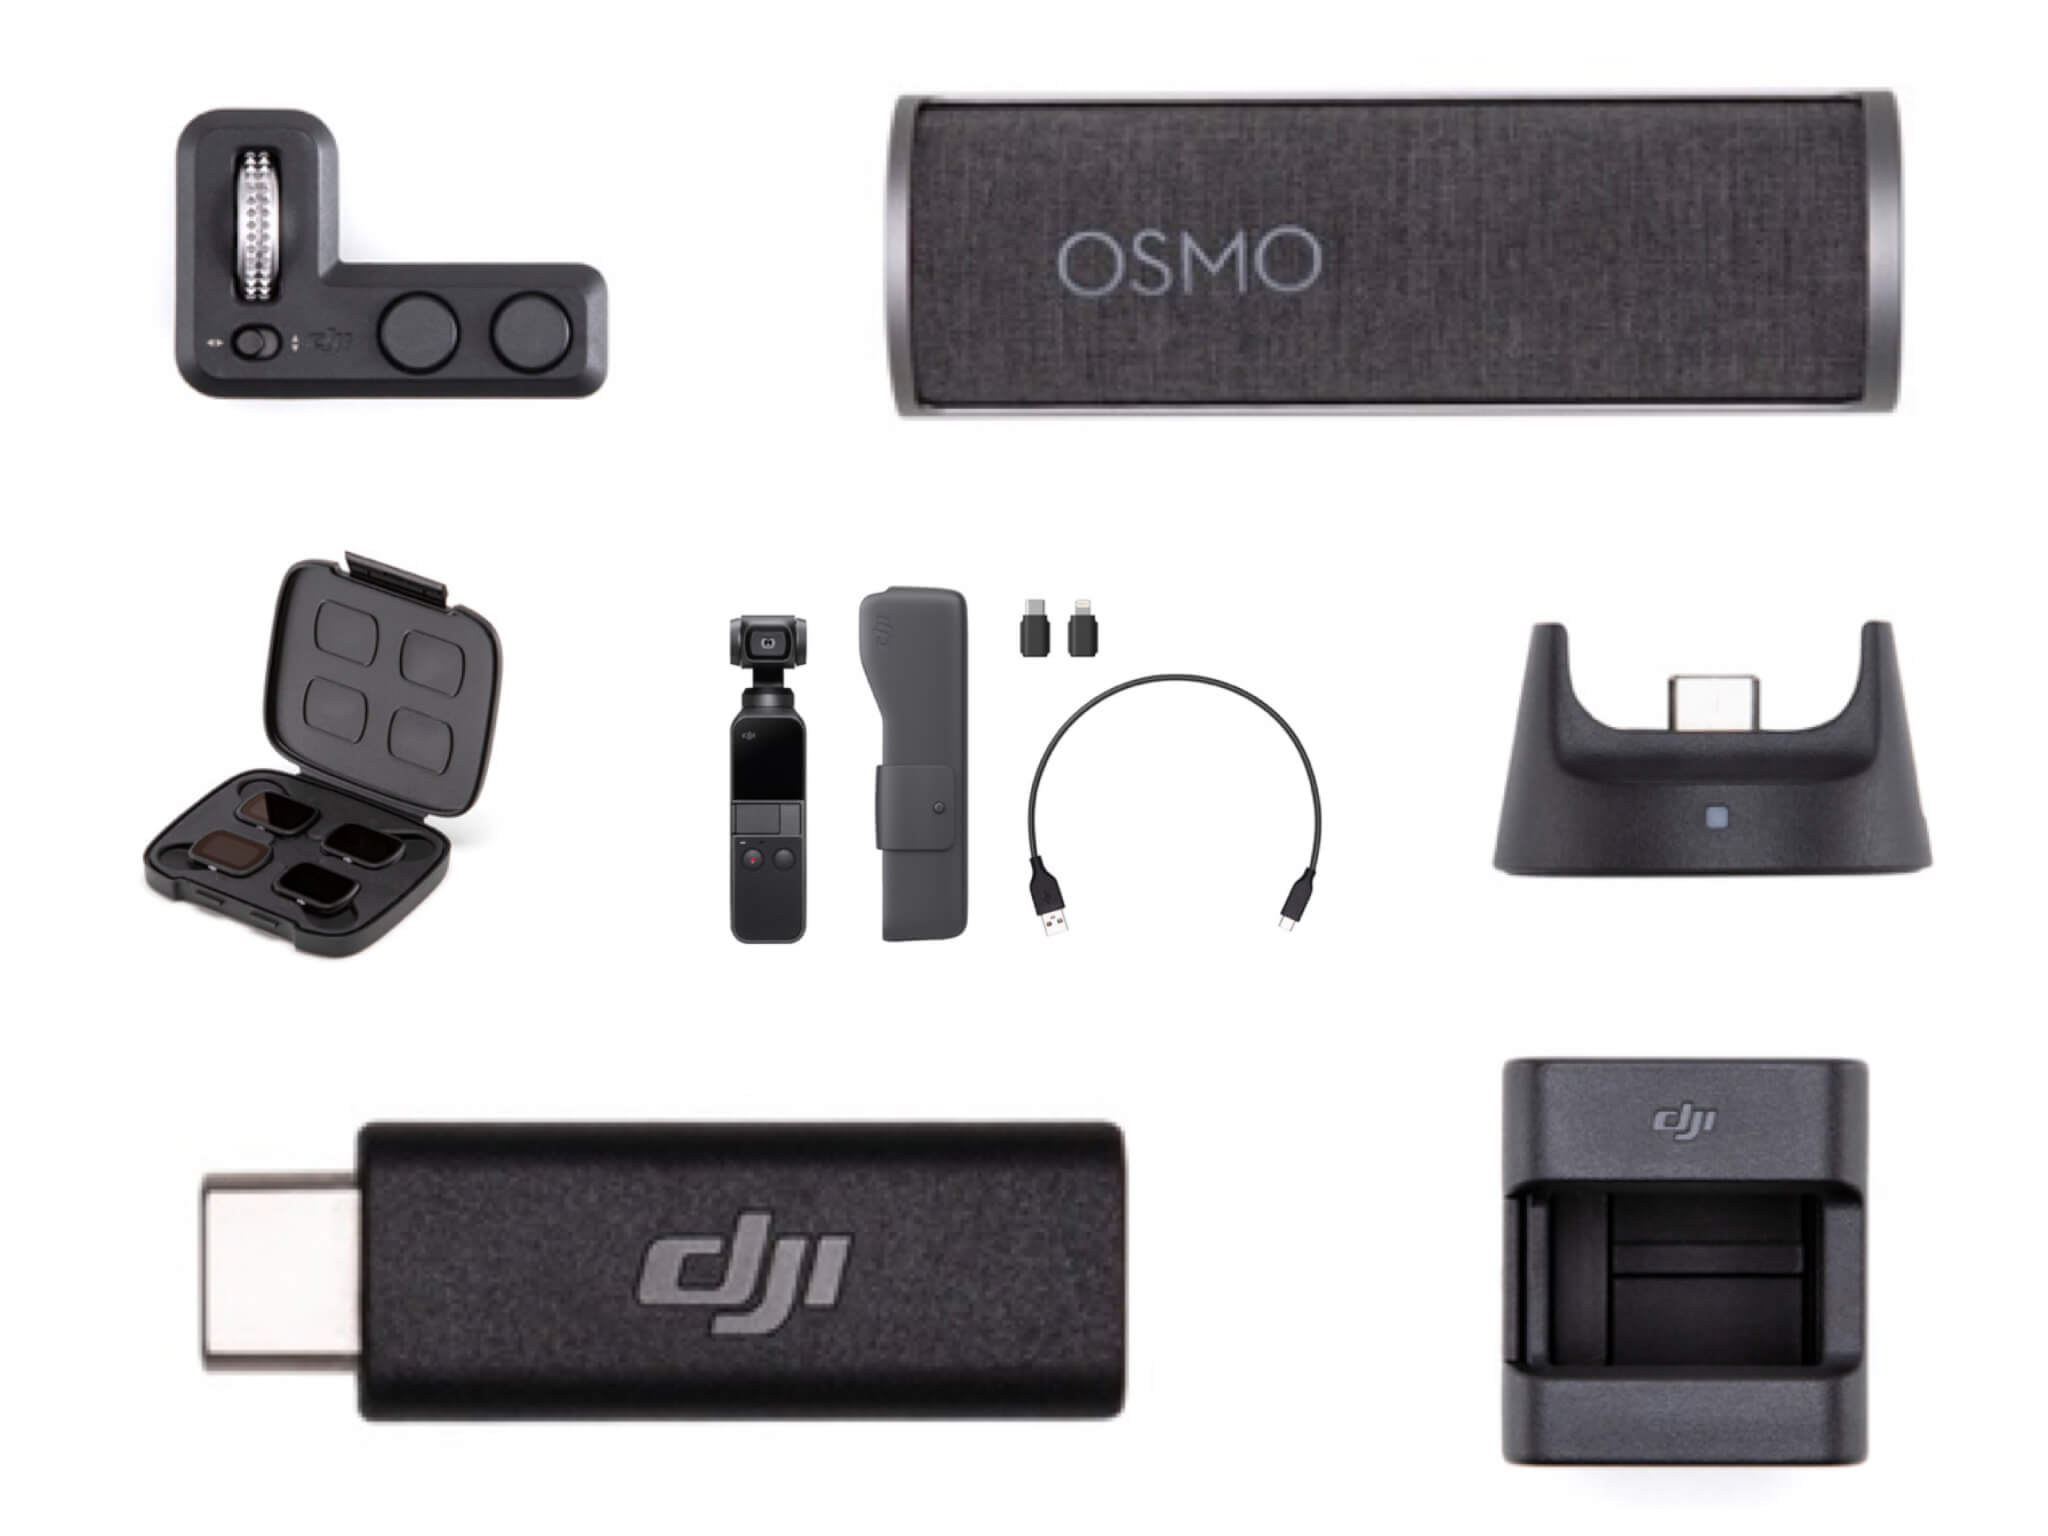 DJI Osmo Pocketを最大限に楽しむためのおすすめアクセサリー7選!純正品を選ぶべき理由とは